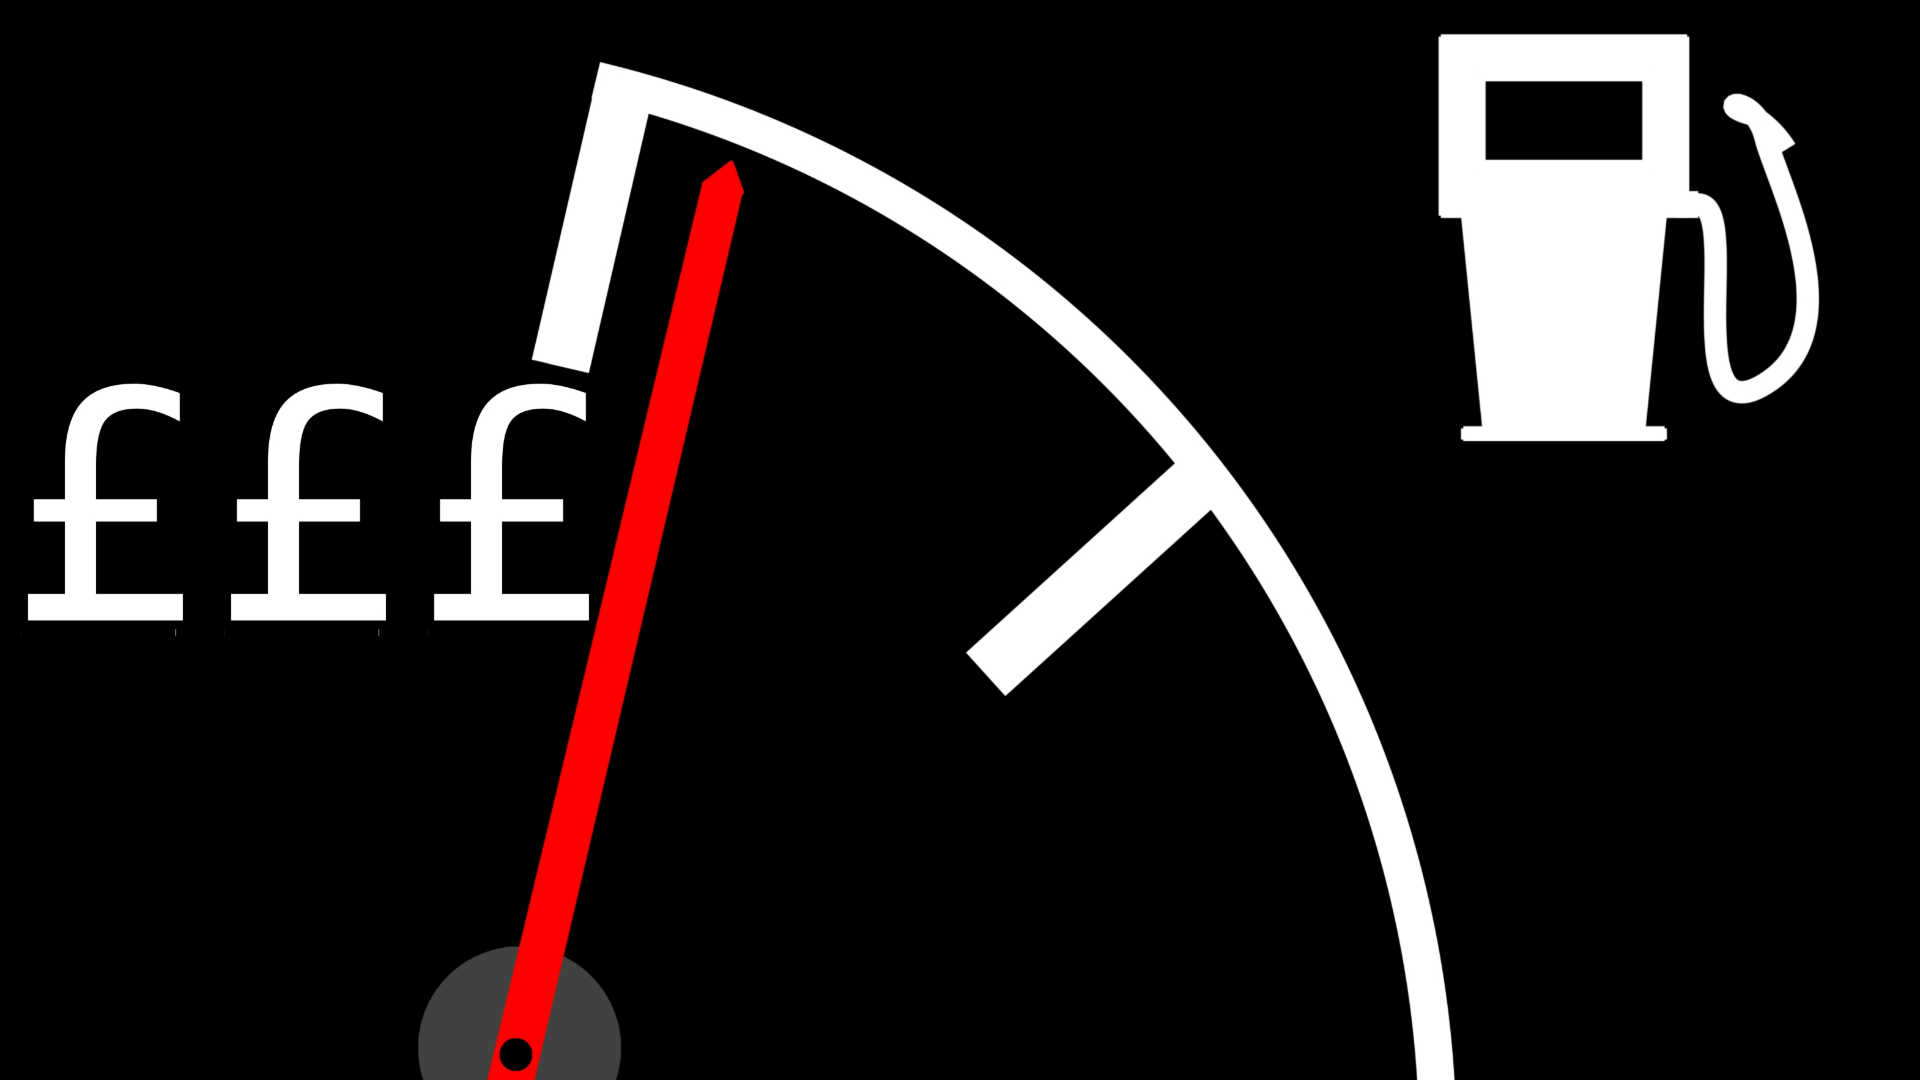 Lifetime cost of petrol